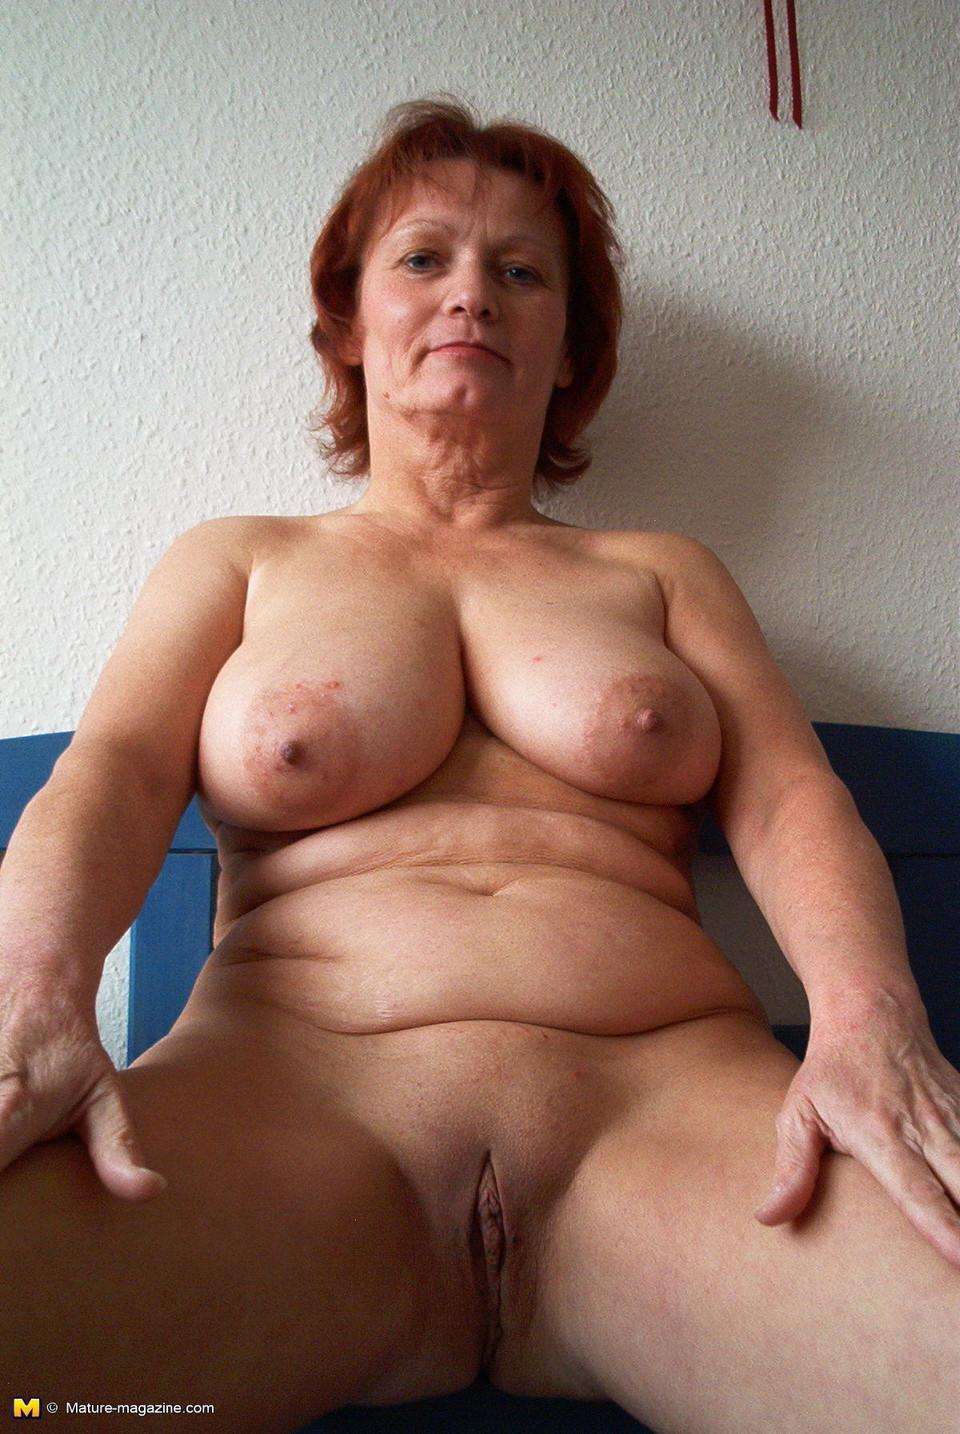 Older women naked Older Mom